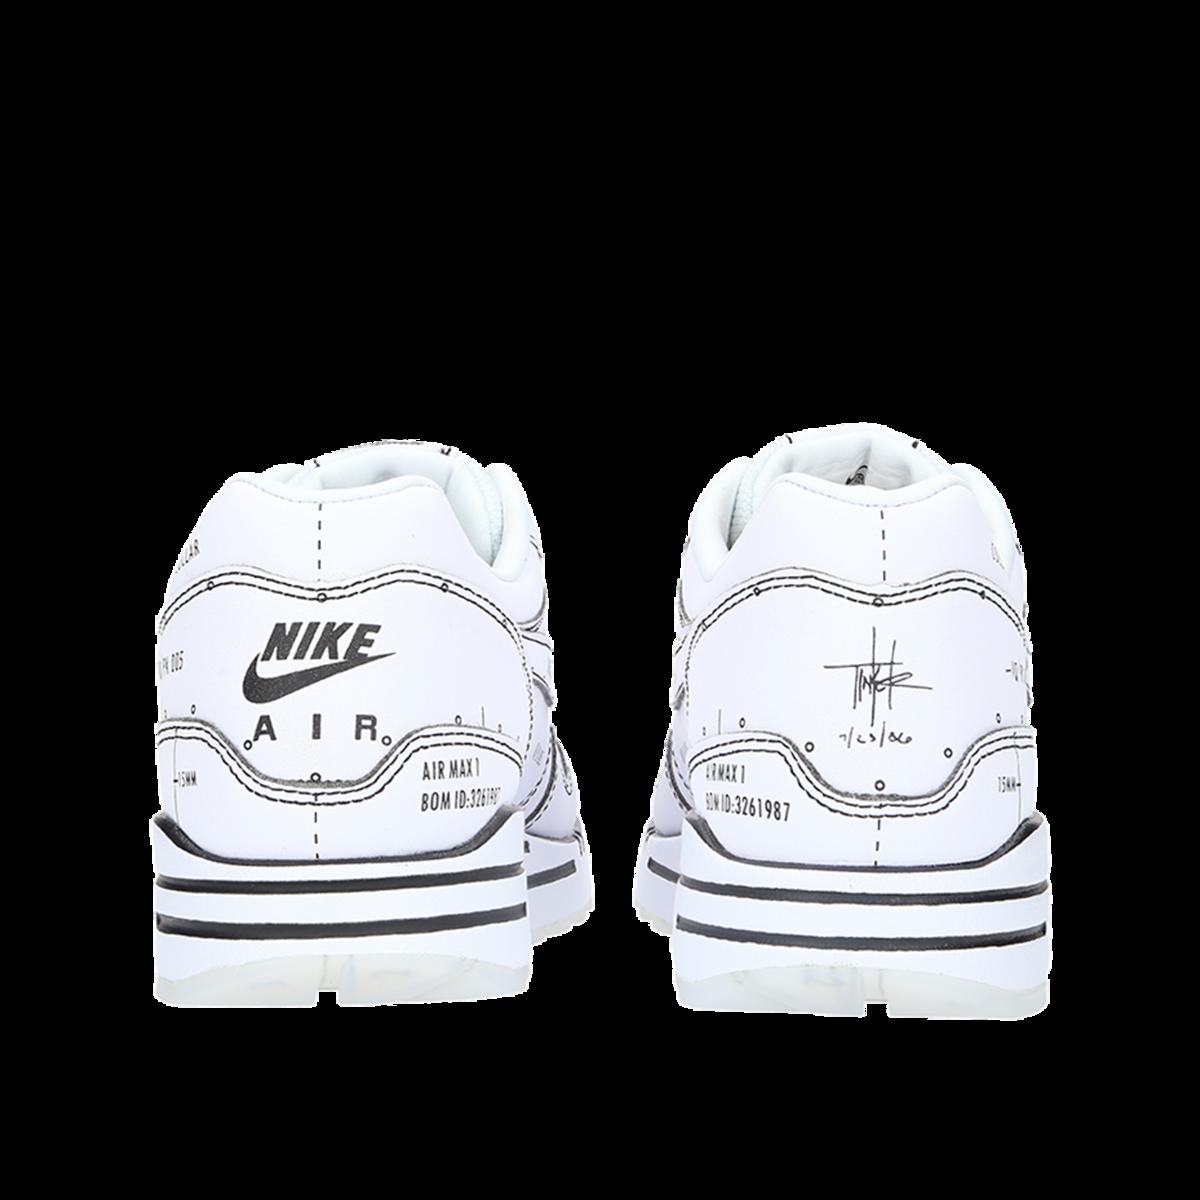 Nike Air Max 1 Schematic Sketch To Shelf Garmentory